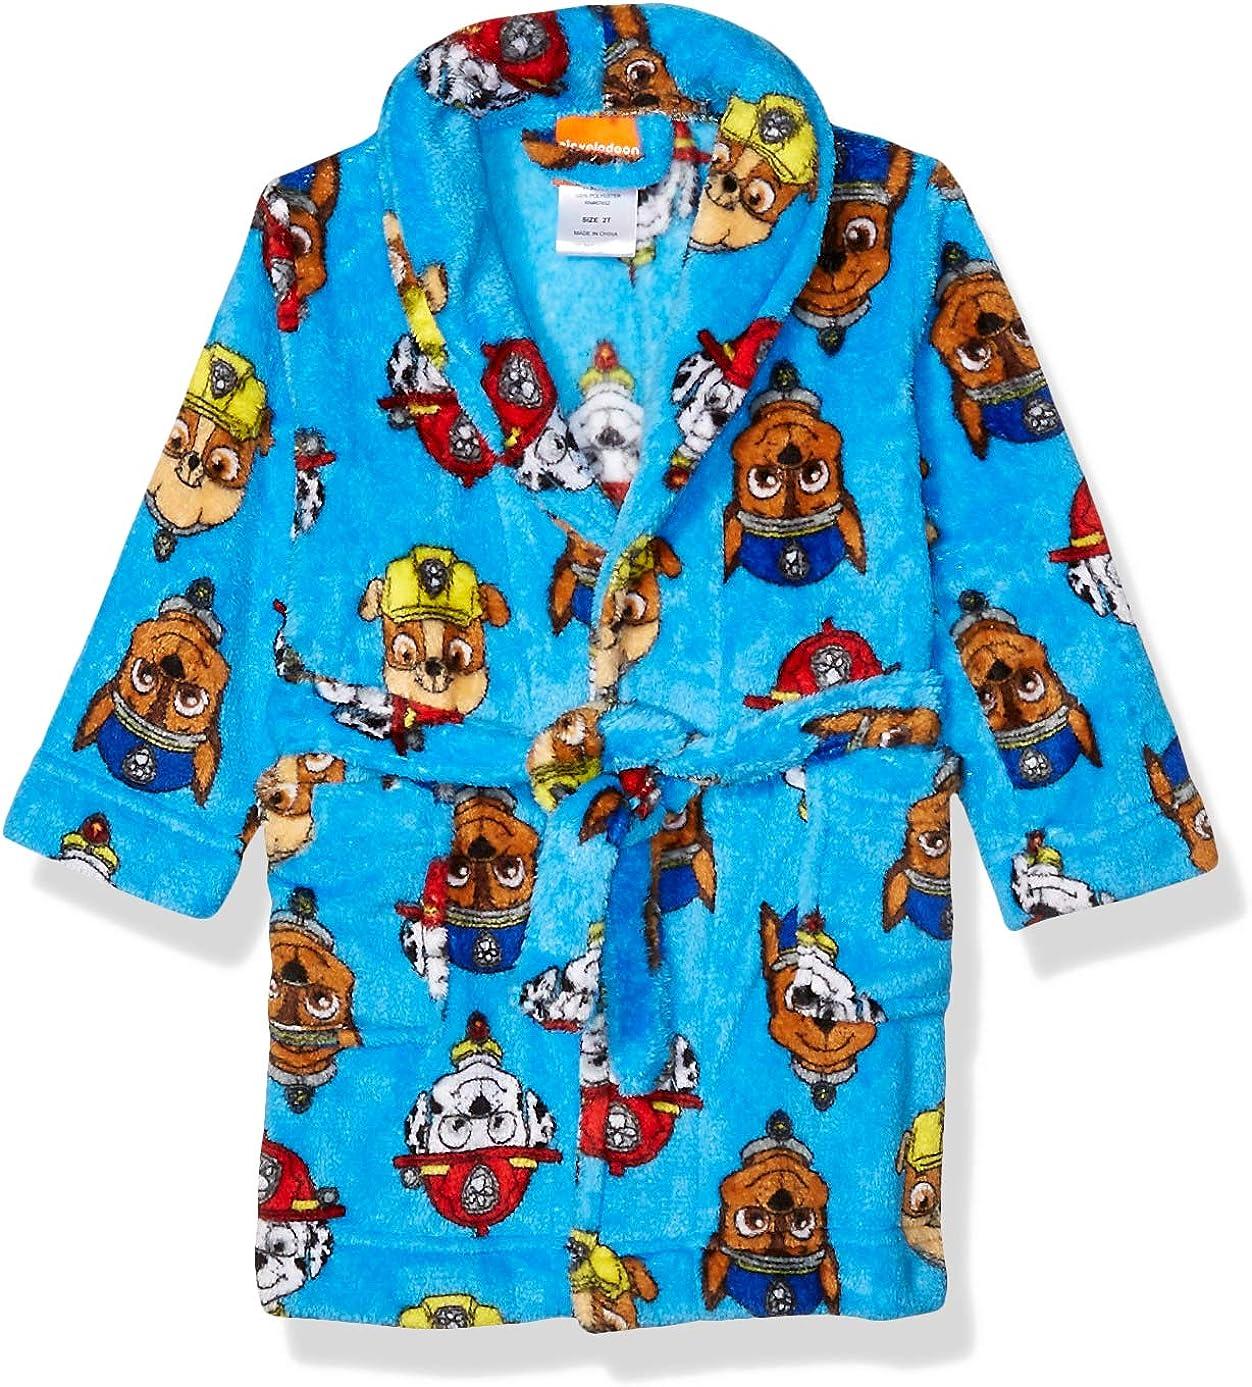 Nickelodeon boys Paw Patrol Luxe Plush Robe